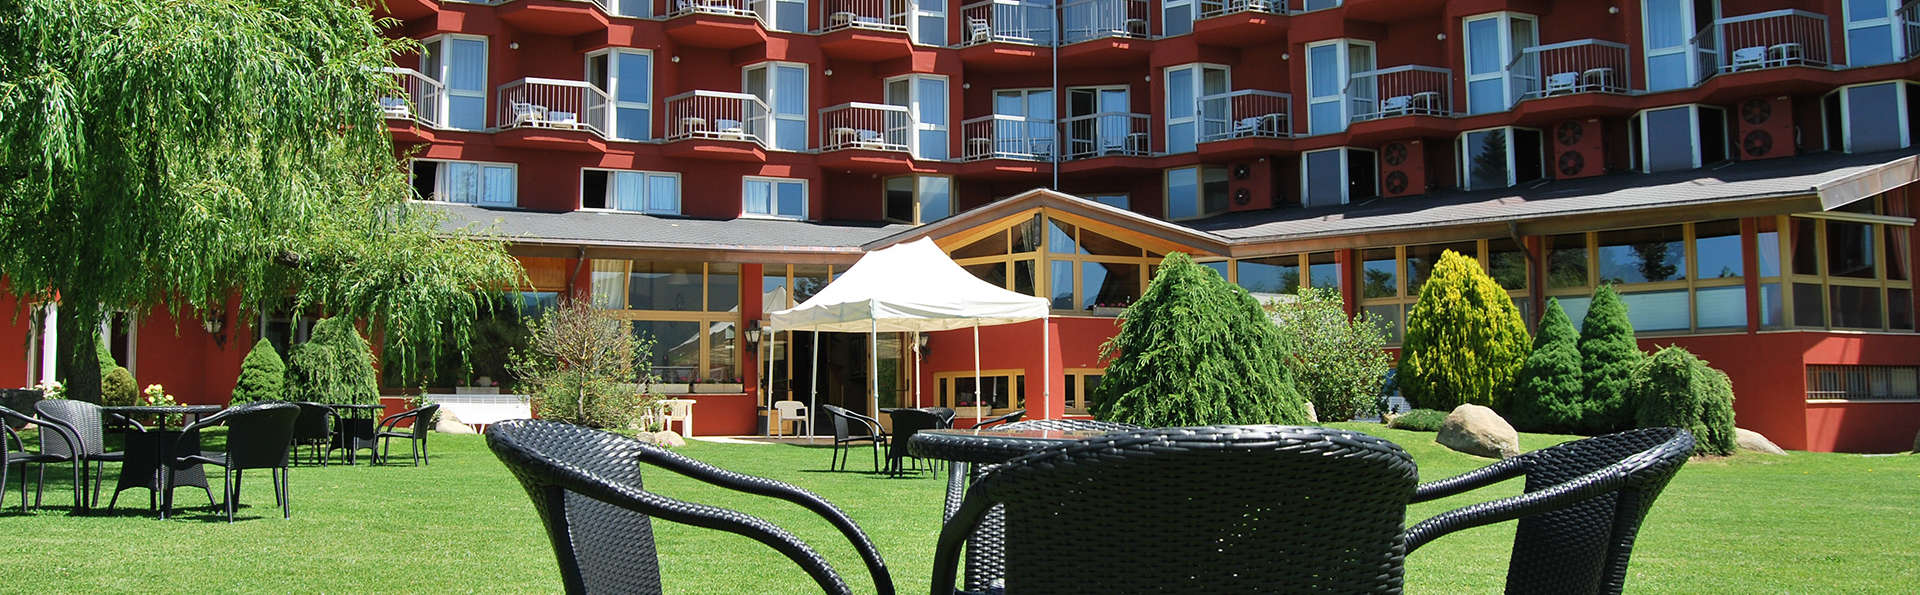 Park Hotel & Spa Puigcerdá - EDIT_front1.jpg